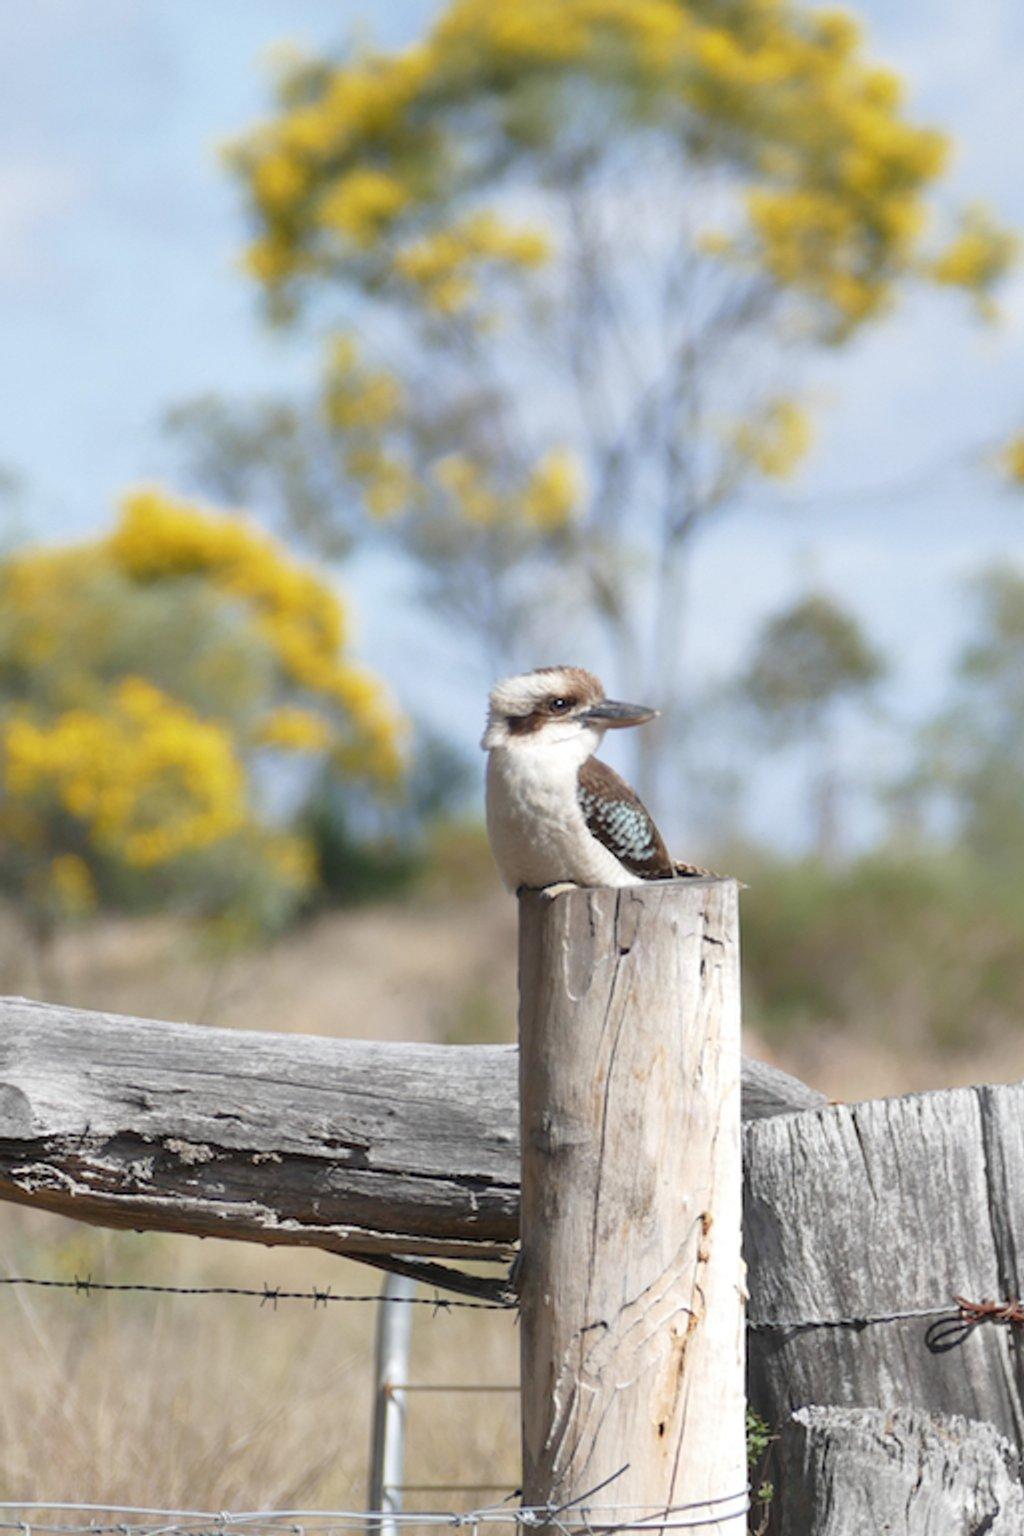 Kookaburra at Ballandean by hrs